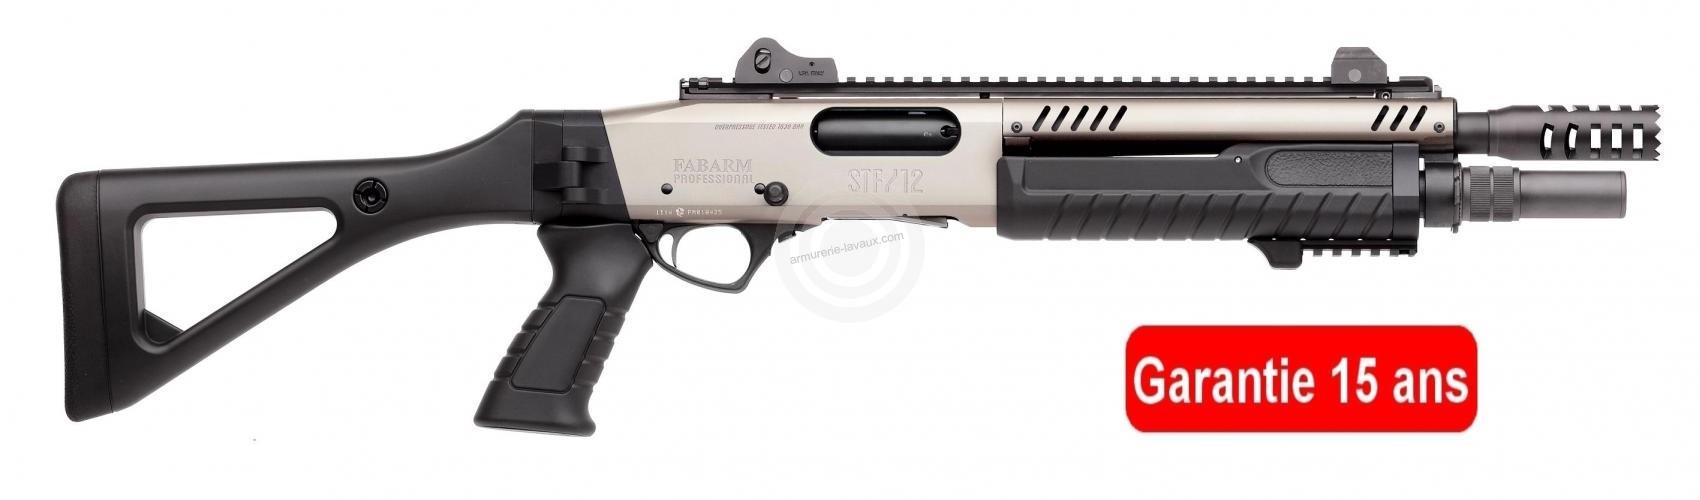 Fusil à pompe FABARM STF12 Compact Professionnal Nickelé 11